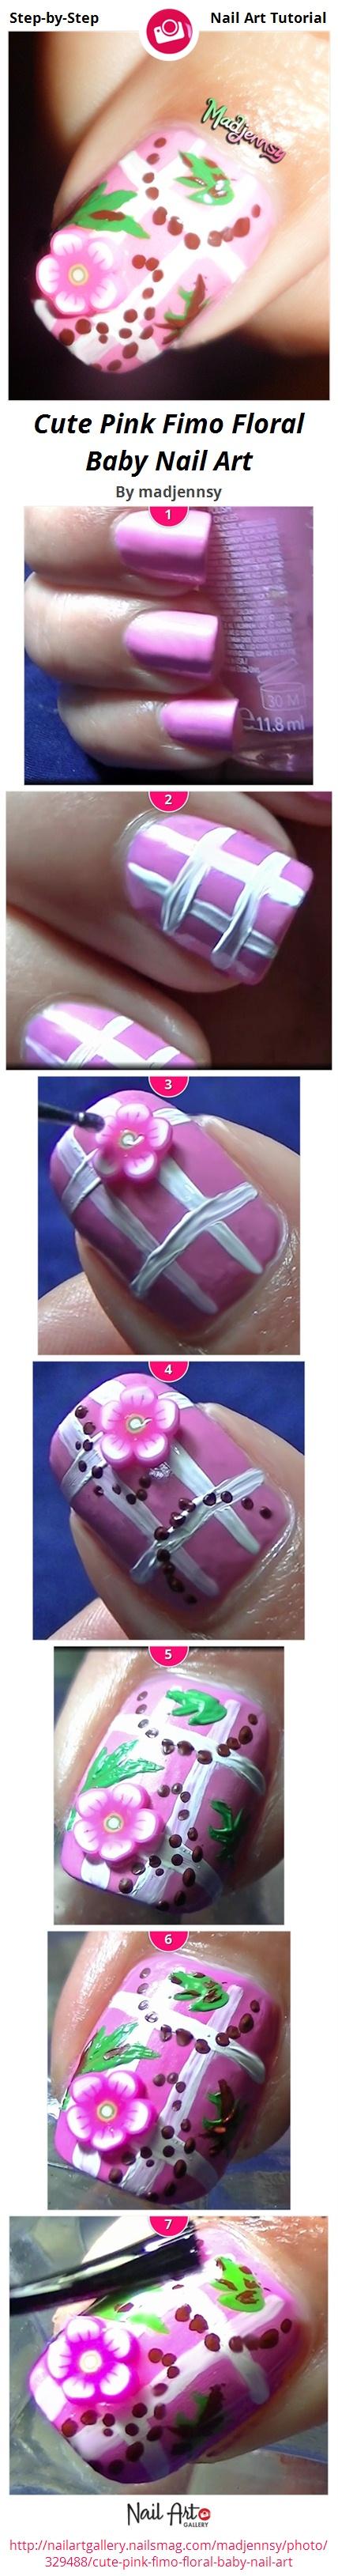 Cute Pink Fimo Floral Baby Nail Art - Nail Art Gallery